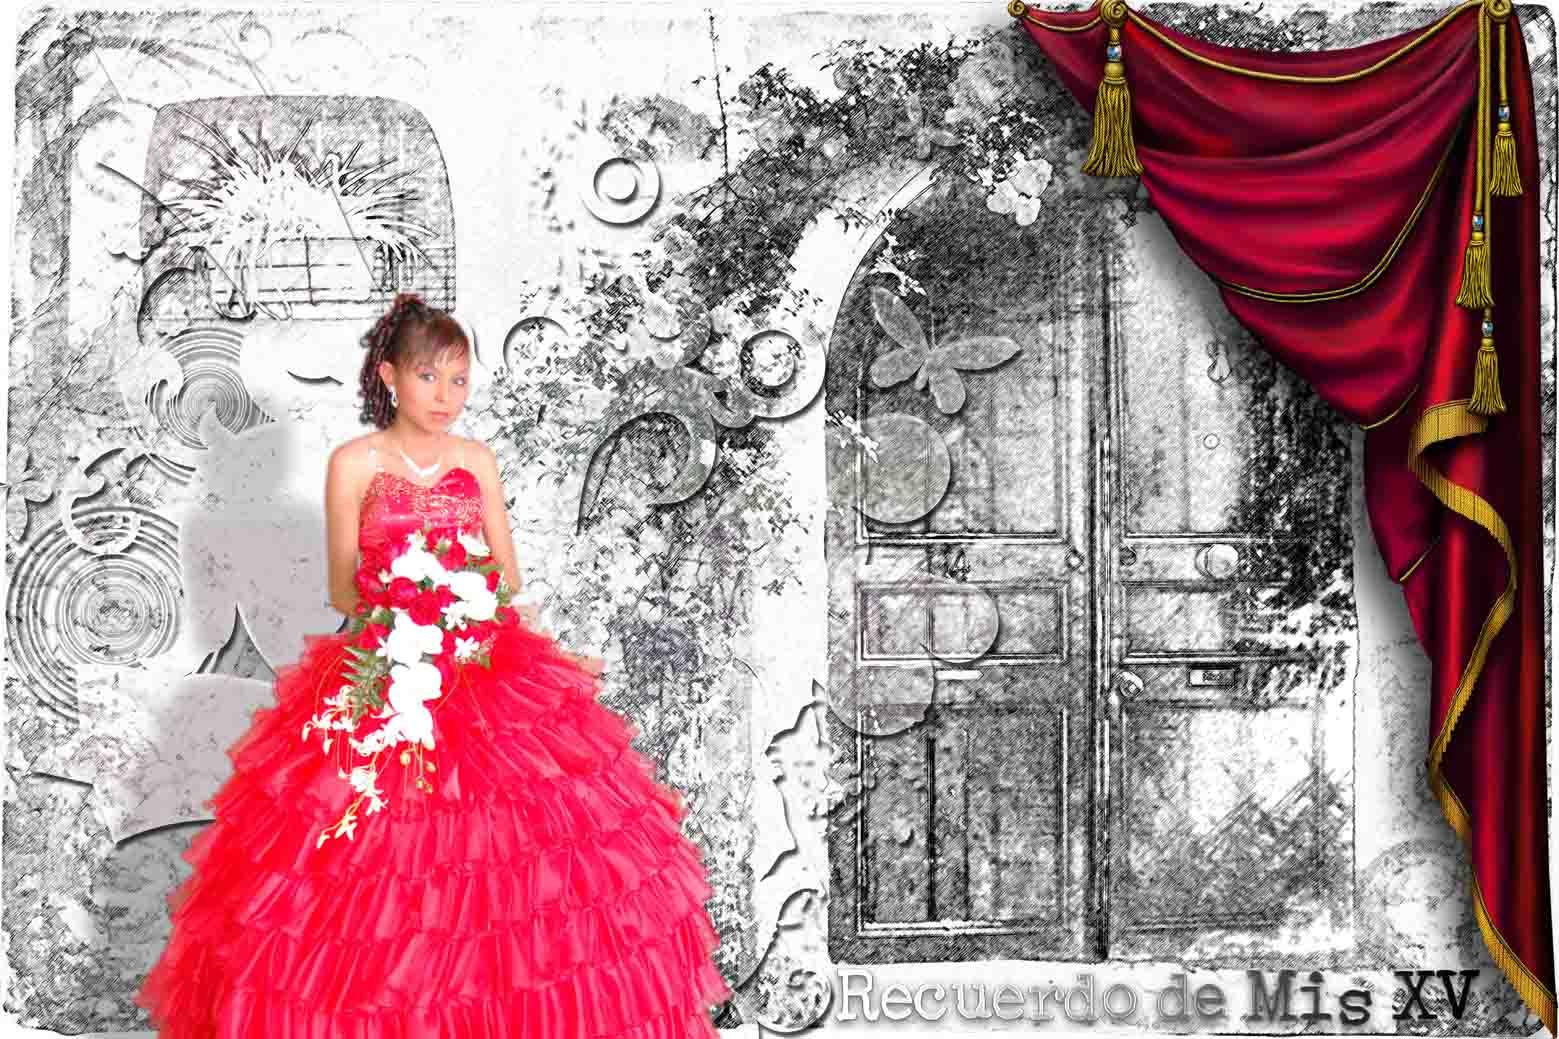 http://1.bp.blogspot.com/-Szna3deT_Ws/Tg7cHiLKdlI/AAAAAAAAATI/RxtyfvDnmlg/s1600/plantilla+psd+para+boda+o+XV+a%25C3%25B1os+.jpg